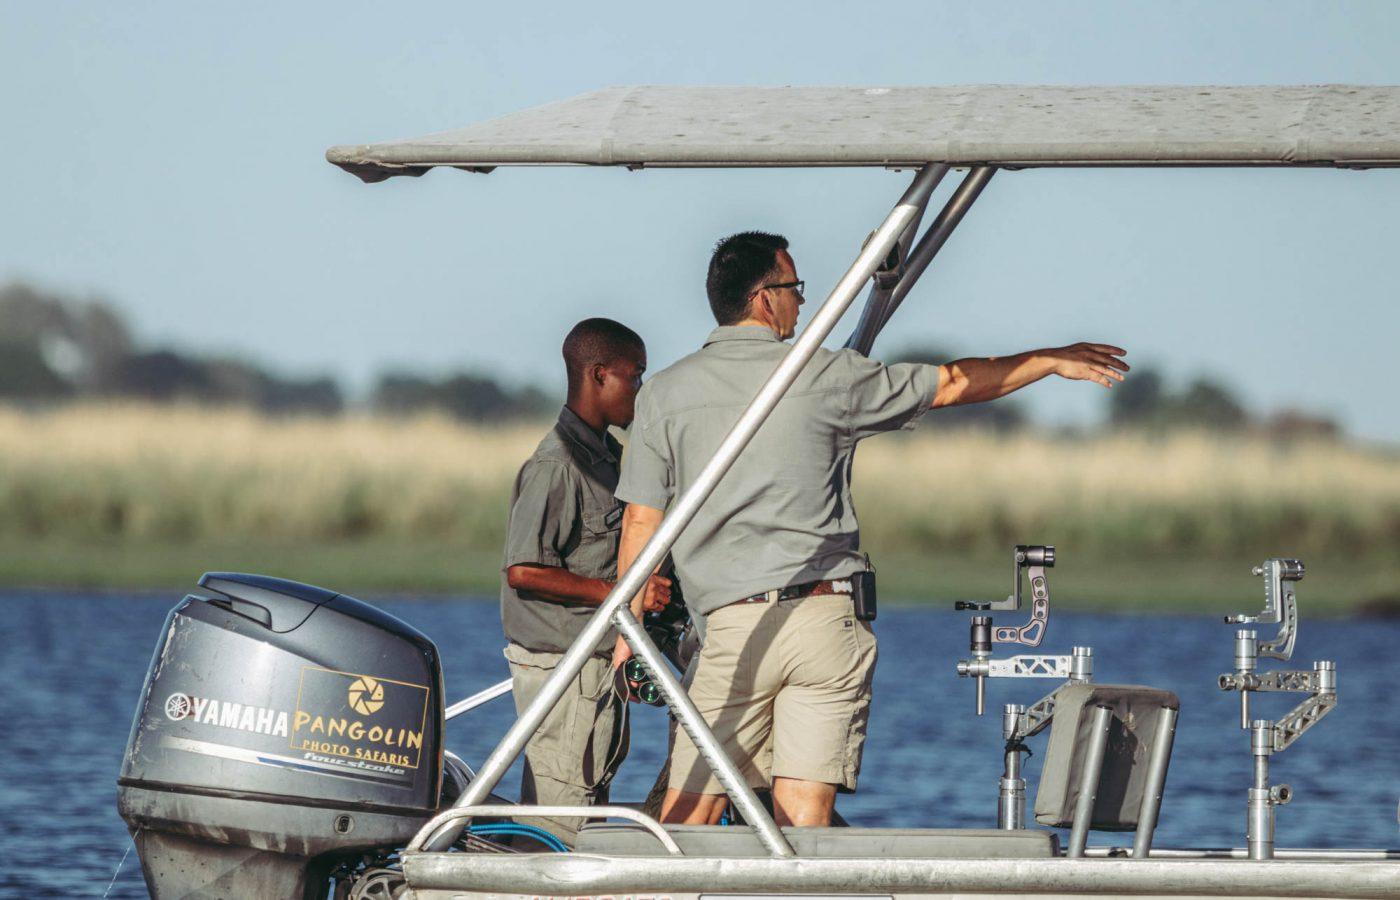 Chobe National Park Safari with